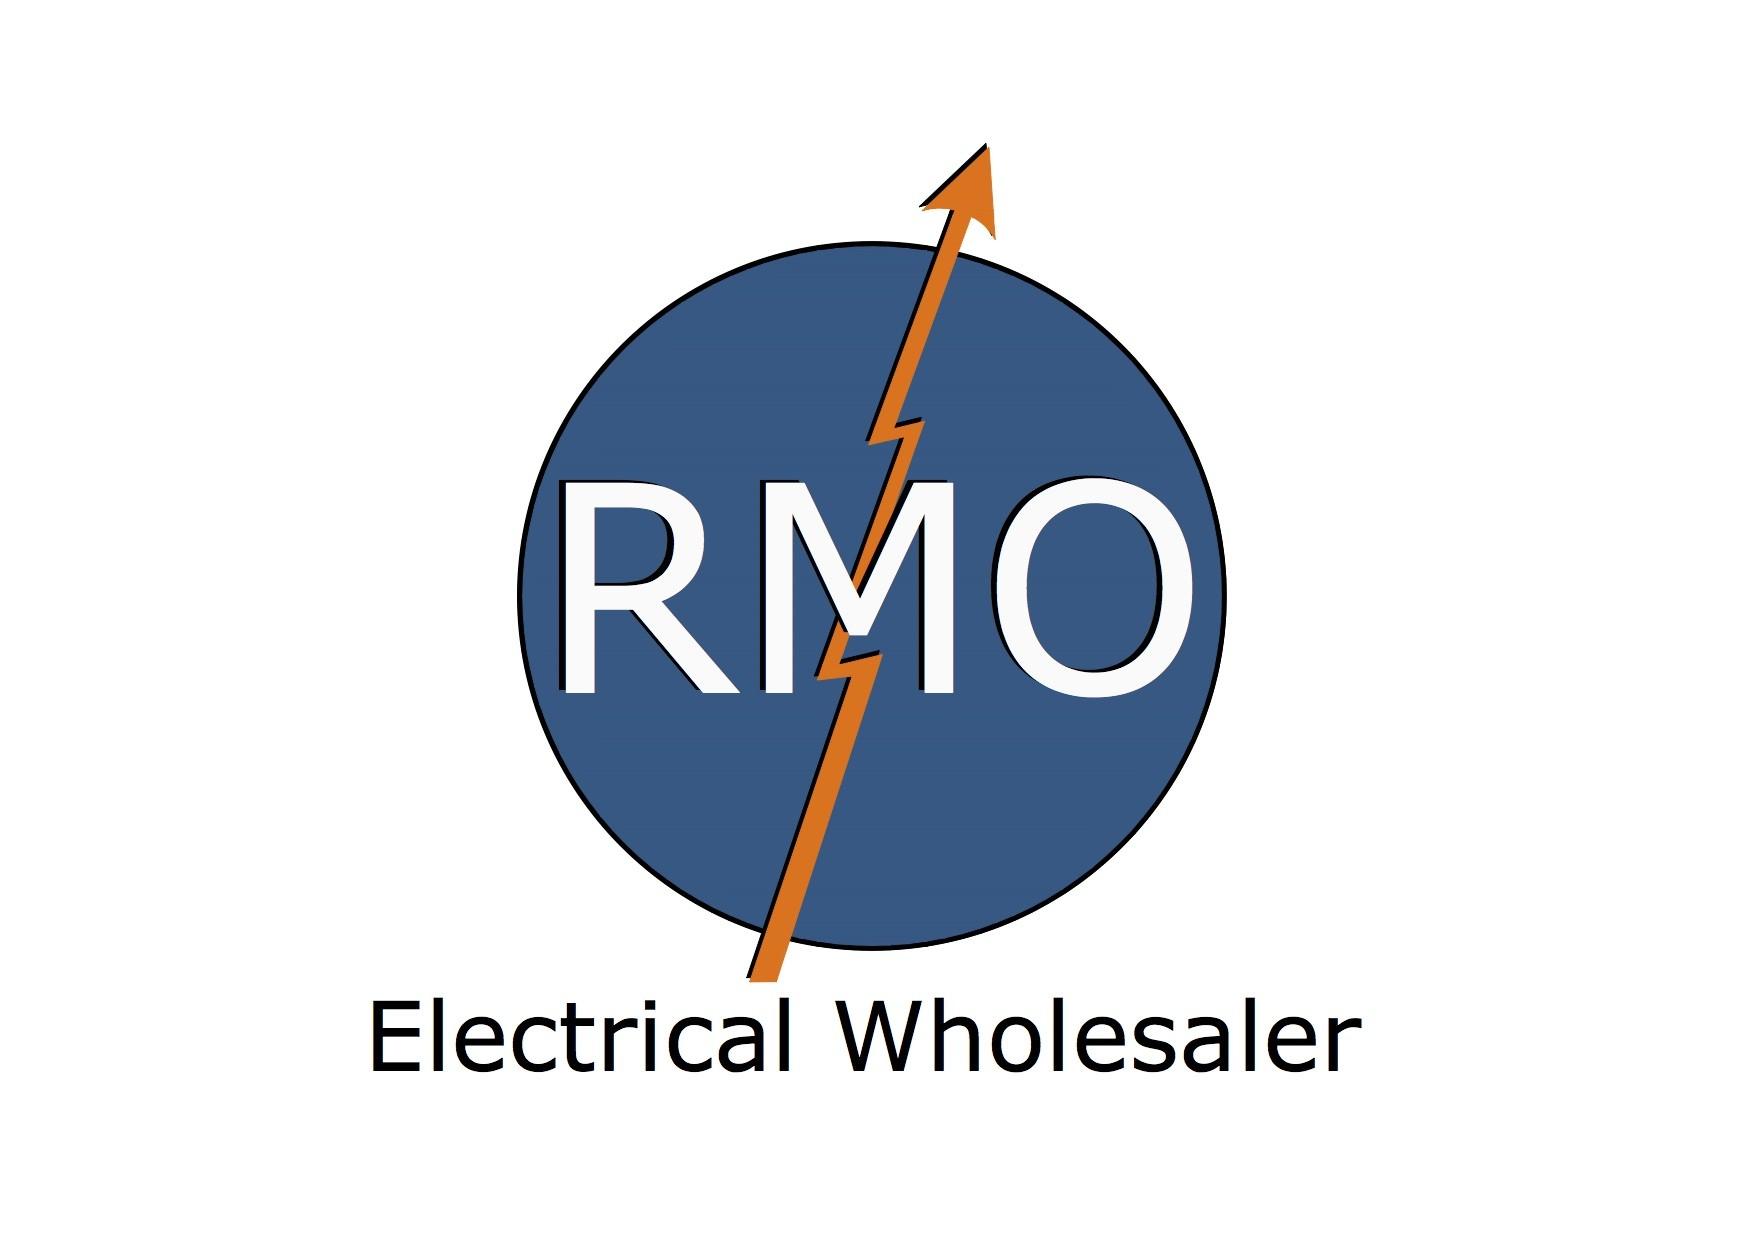 RMO Electrical Wholsaler